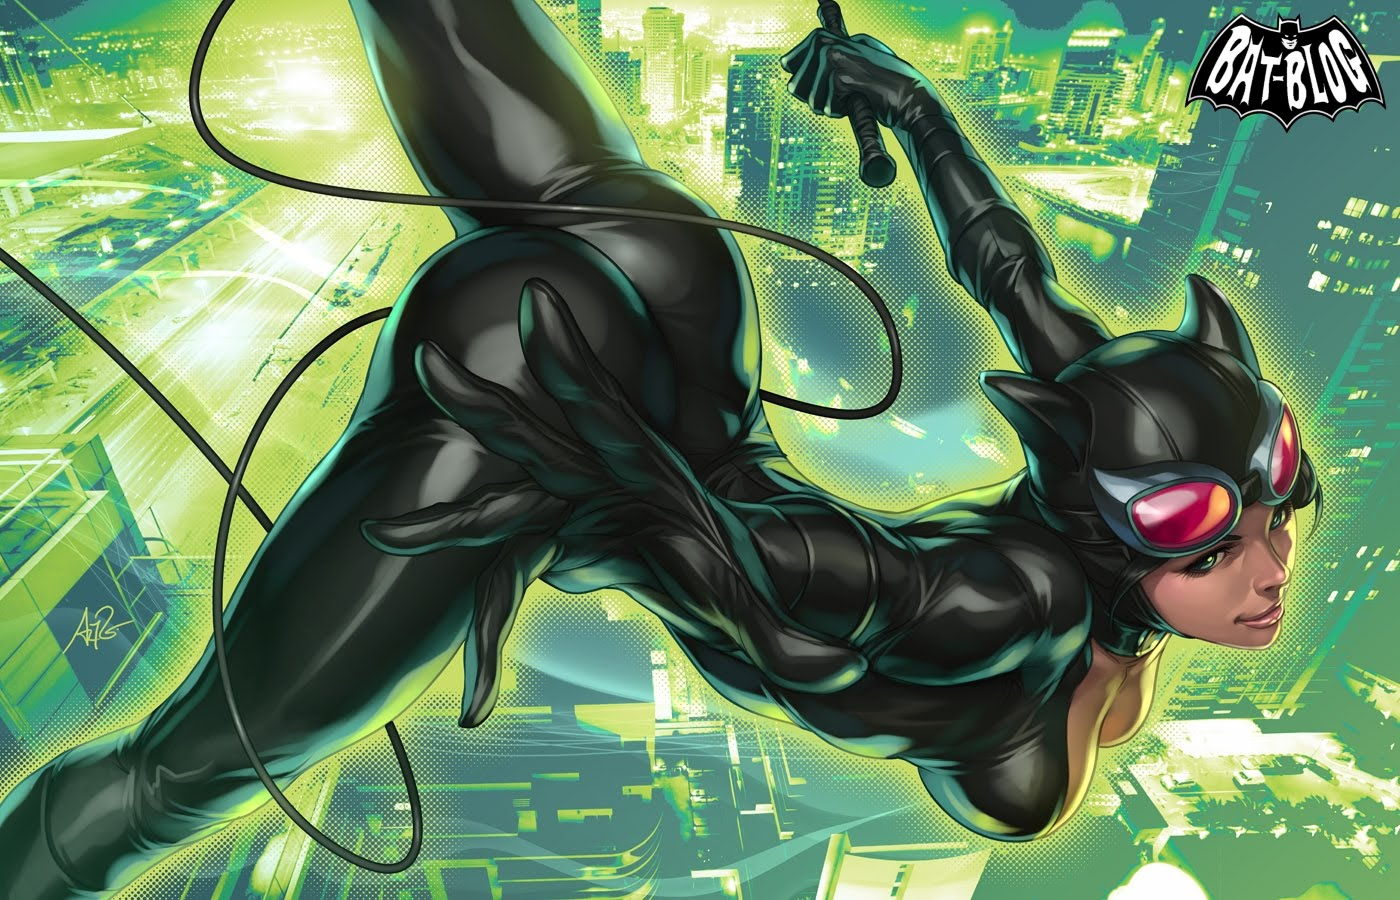 BATMAN TOYS and COLLECTIBLES CATWOMAN   Batman Wallpaper Backgrounds 1400x900